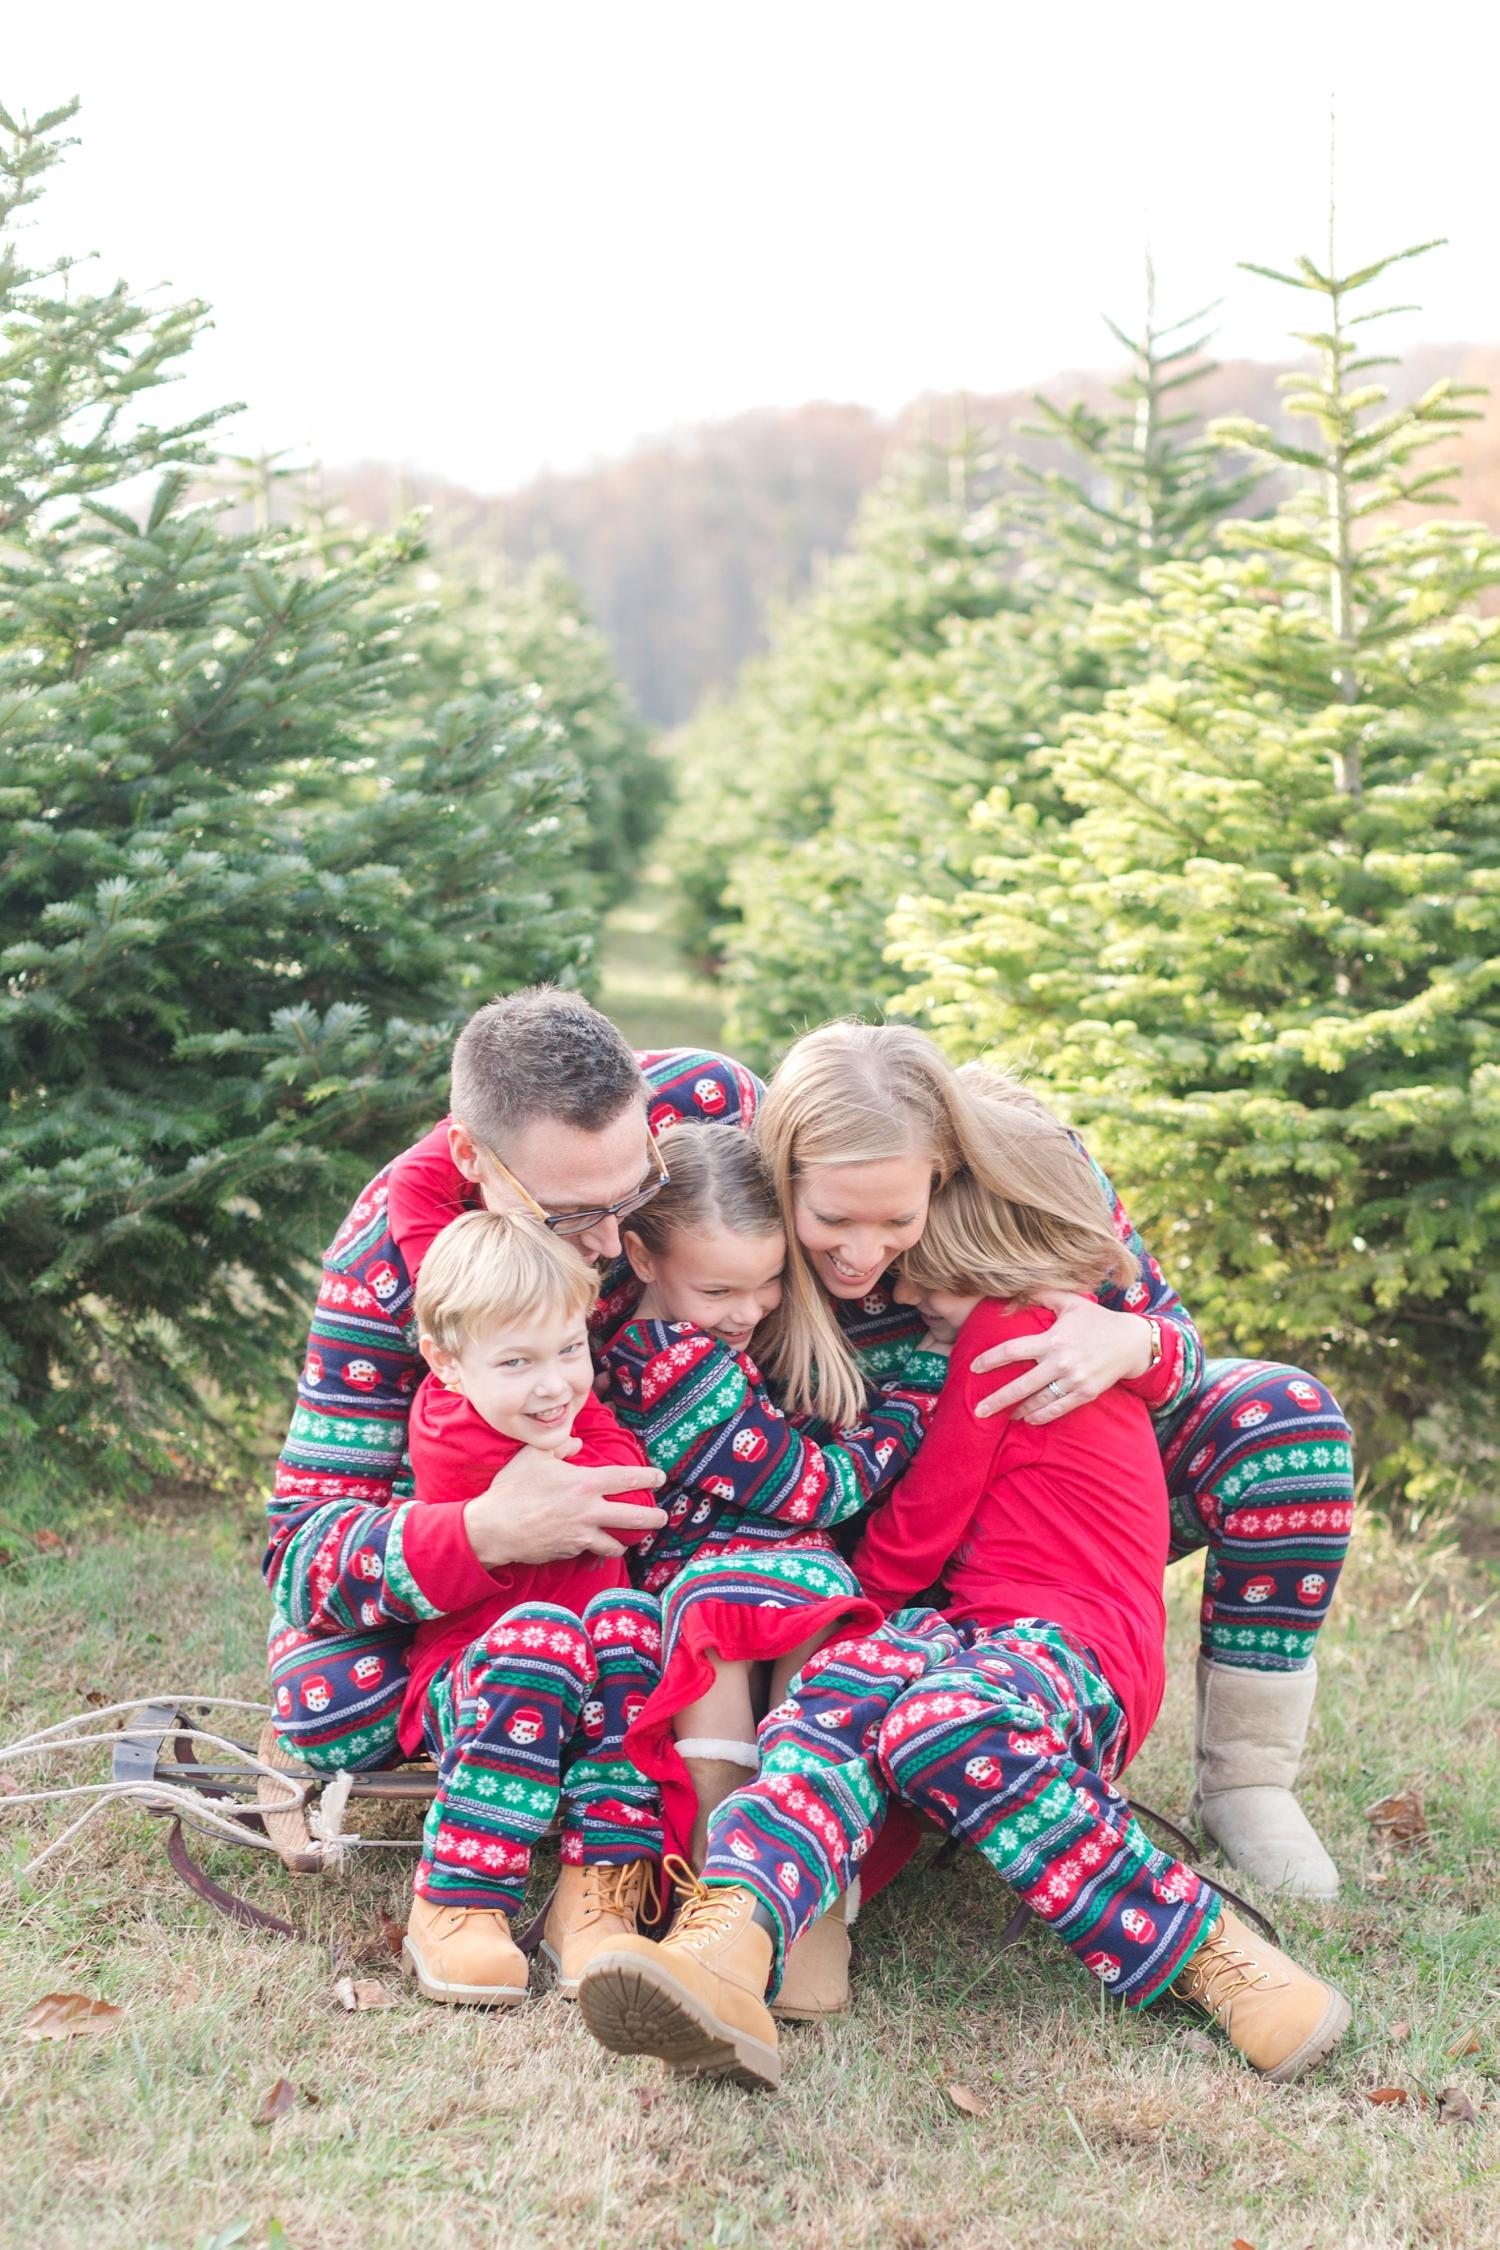 Golembiesky Family 2017-18_ruhl-tree-farm-baltimore-maryland-family-photography-anna-grace-photography-photo.jpg